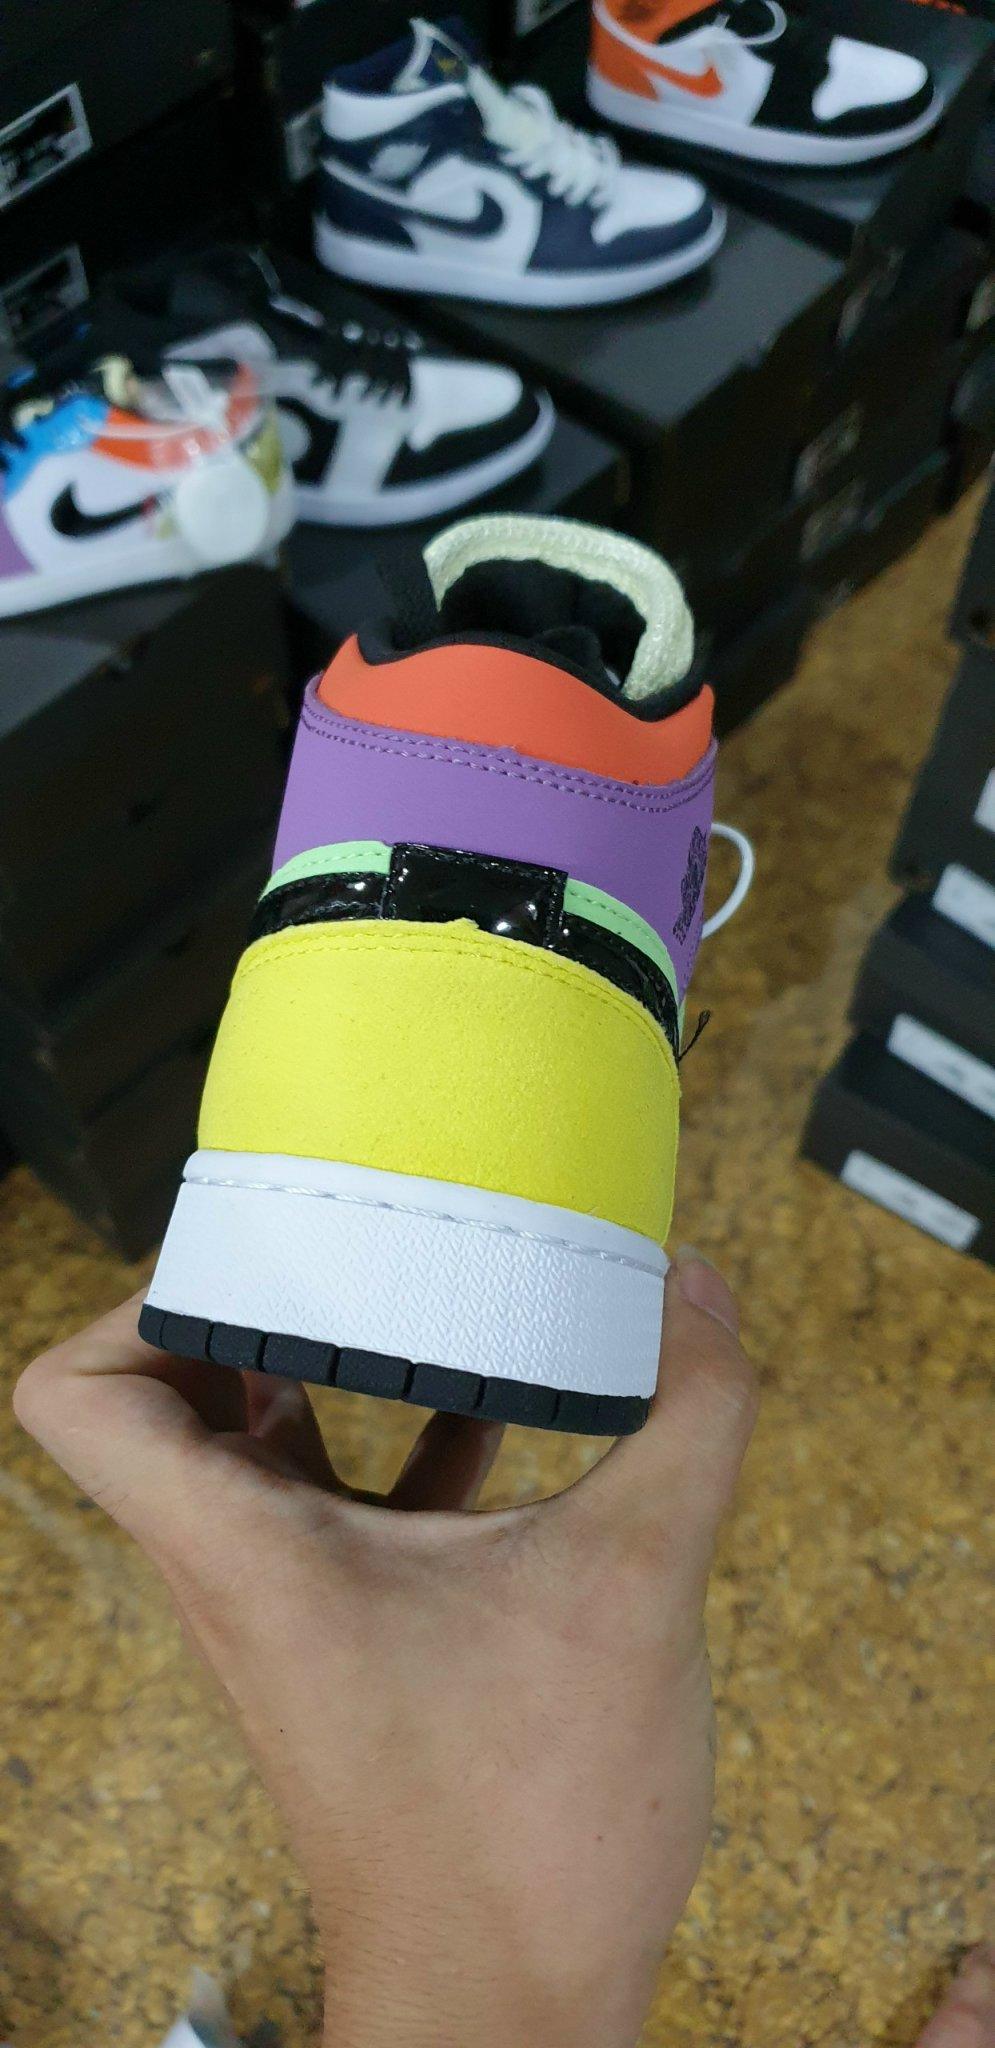 Jordan 1 Mid SE Multi Color  Rep 1:1, Jordan 1 Mid SE Multi Color  SF, Jordan 1 Mid SE Multi Color  Super fake, Jordan 1 Mid SE Multi Color  f1, Jordan 1 Mid SE Multi Color  Replica